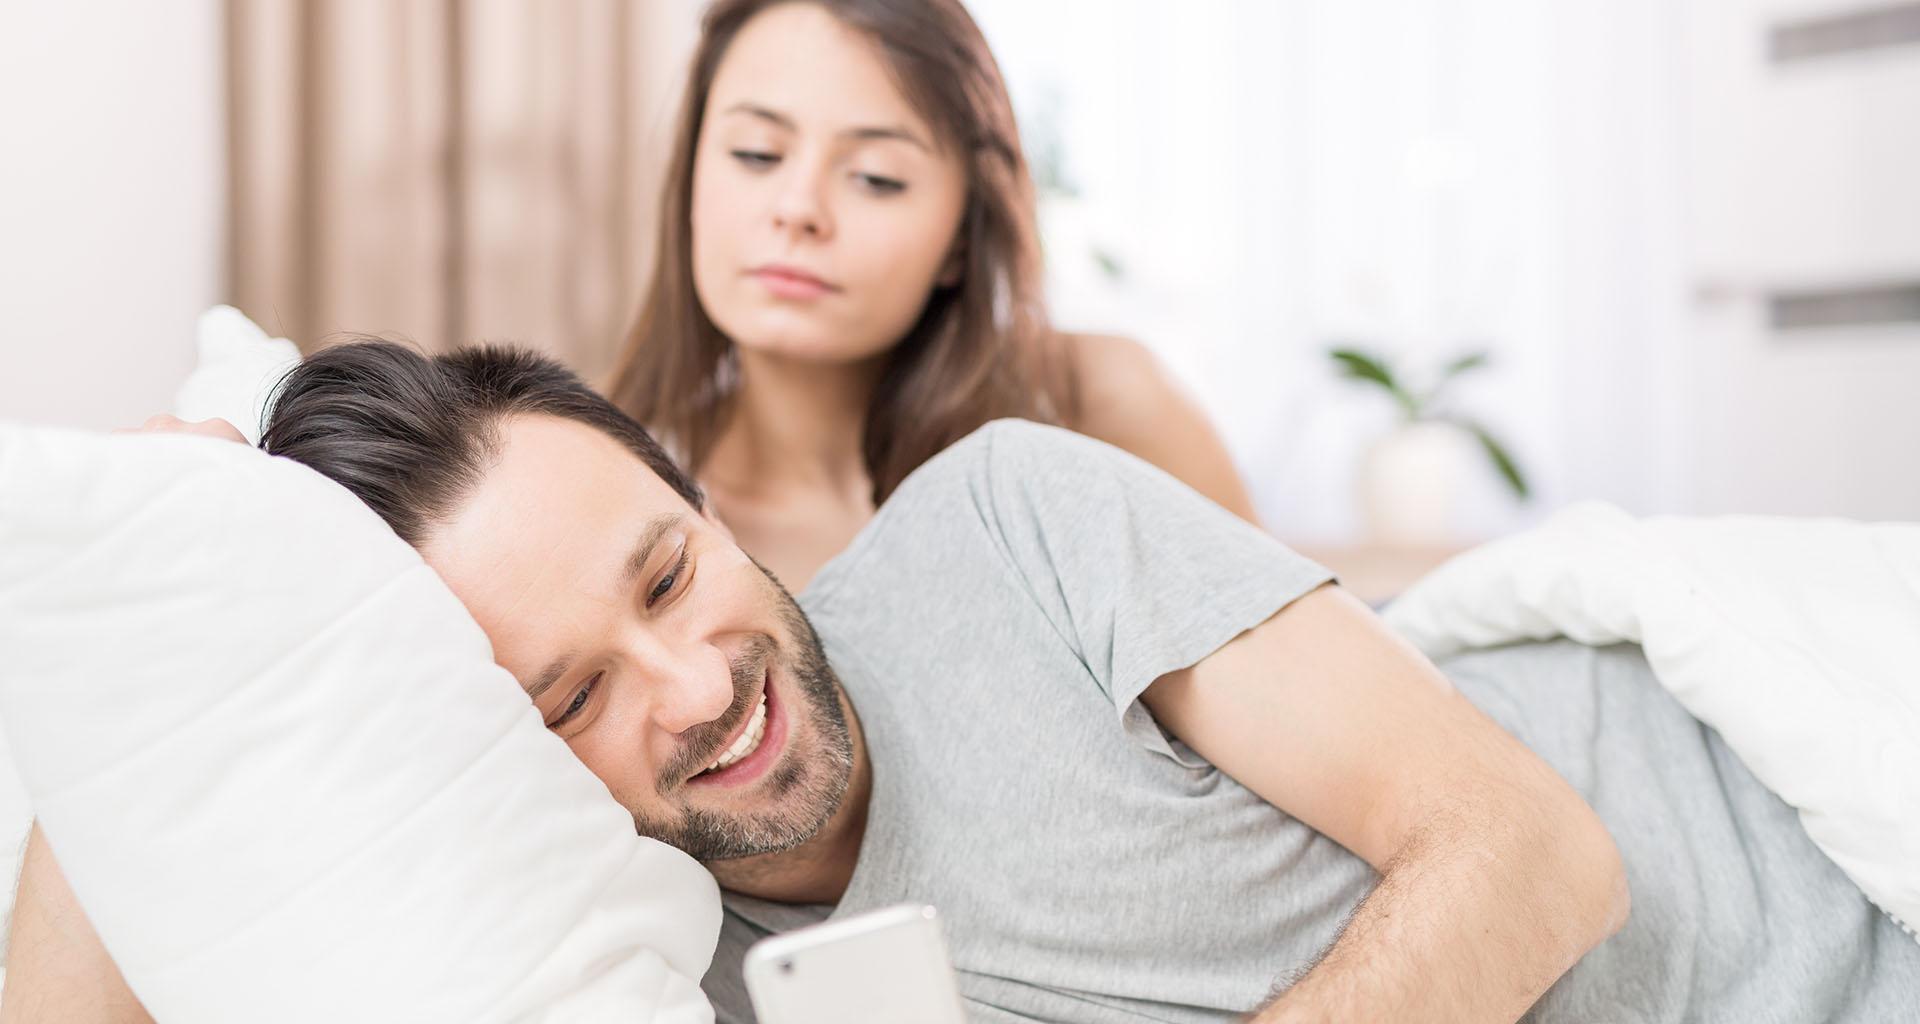 suspicious wife overlooks husband's phone